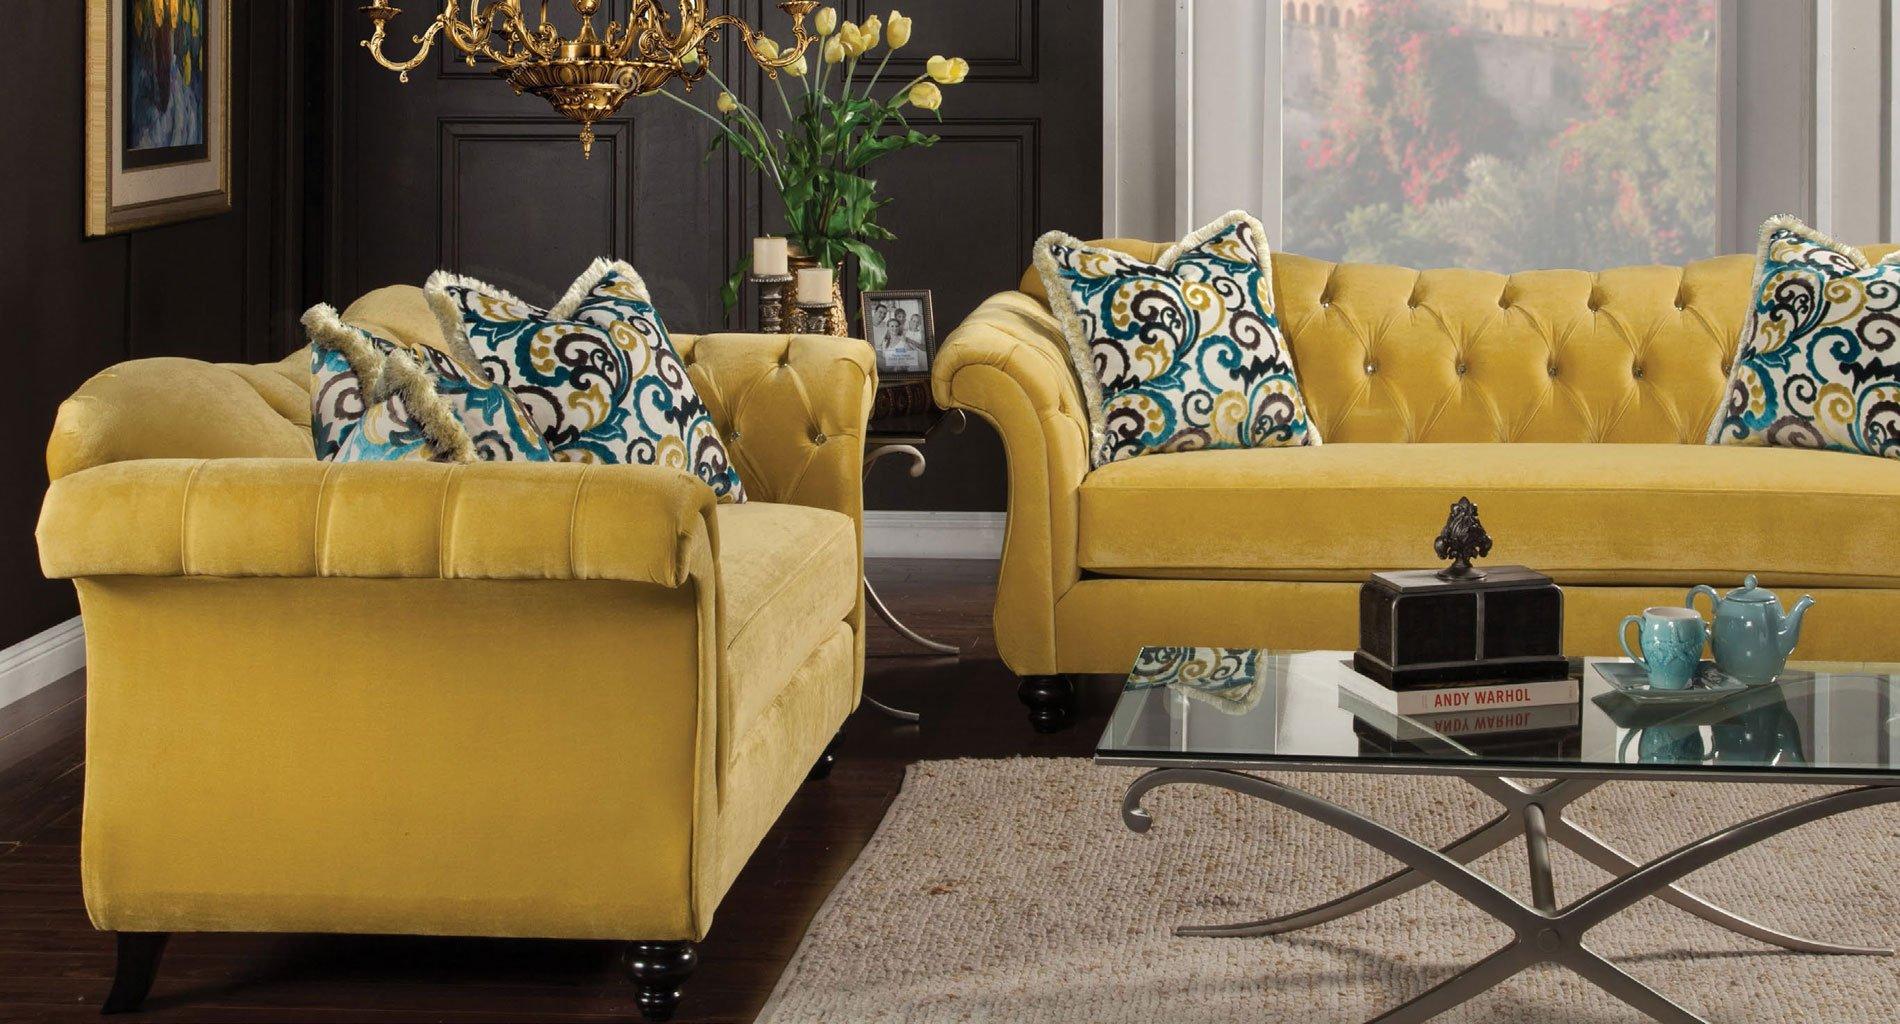 antoinette ii living room set royal yellow living room sets living room furniture living. Black Bedroom Furniture Sets. Home Design Ideas